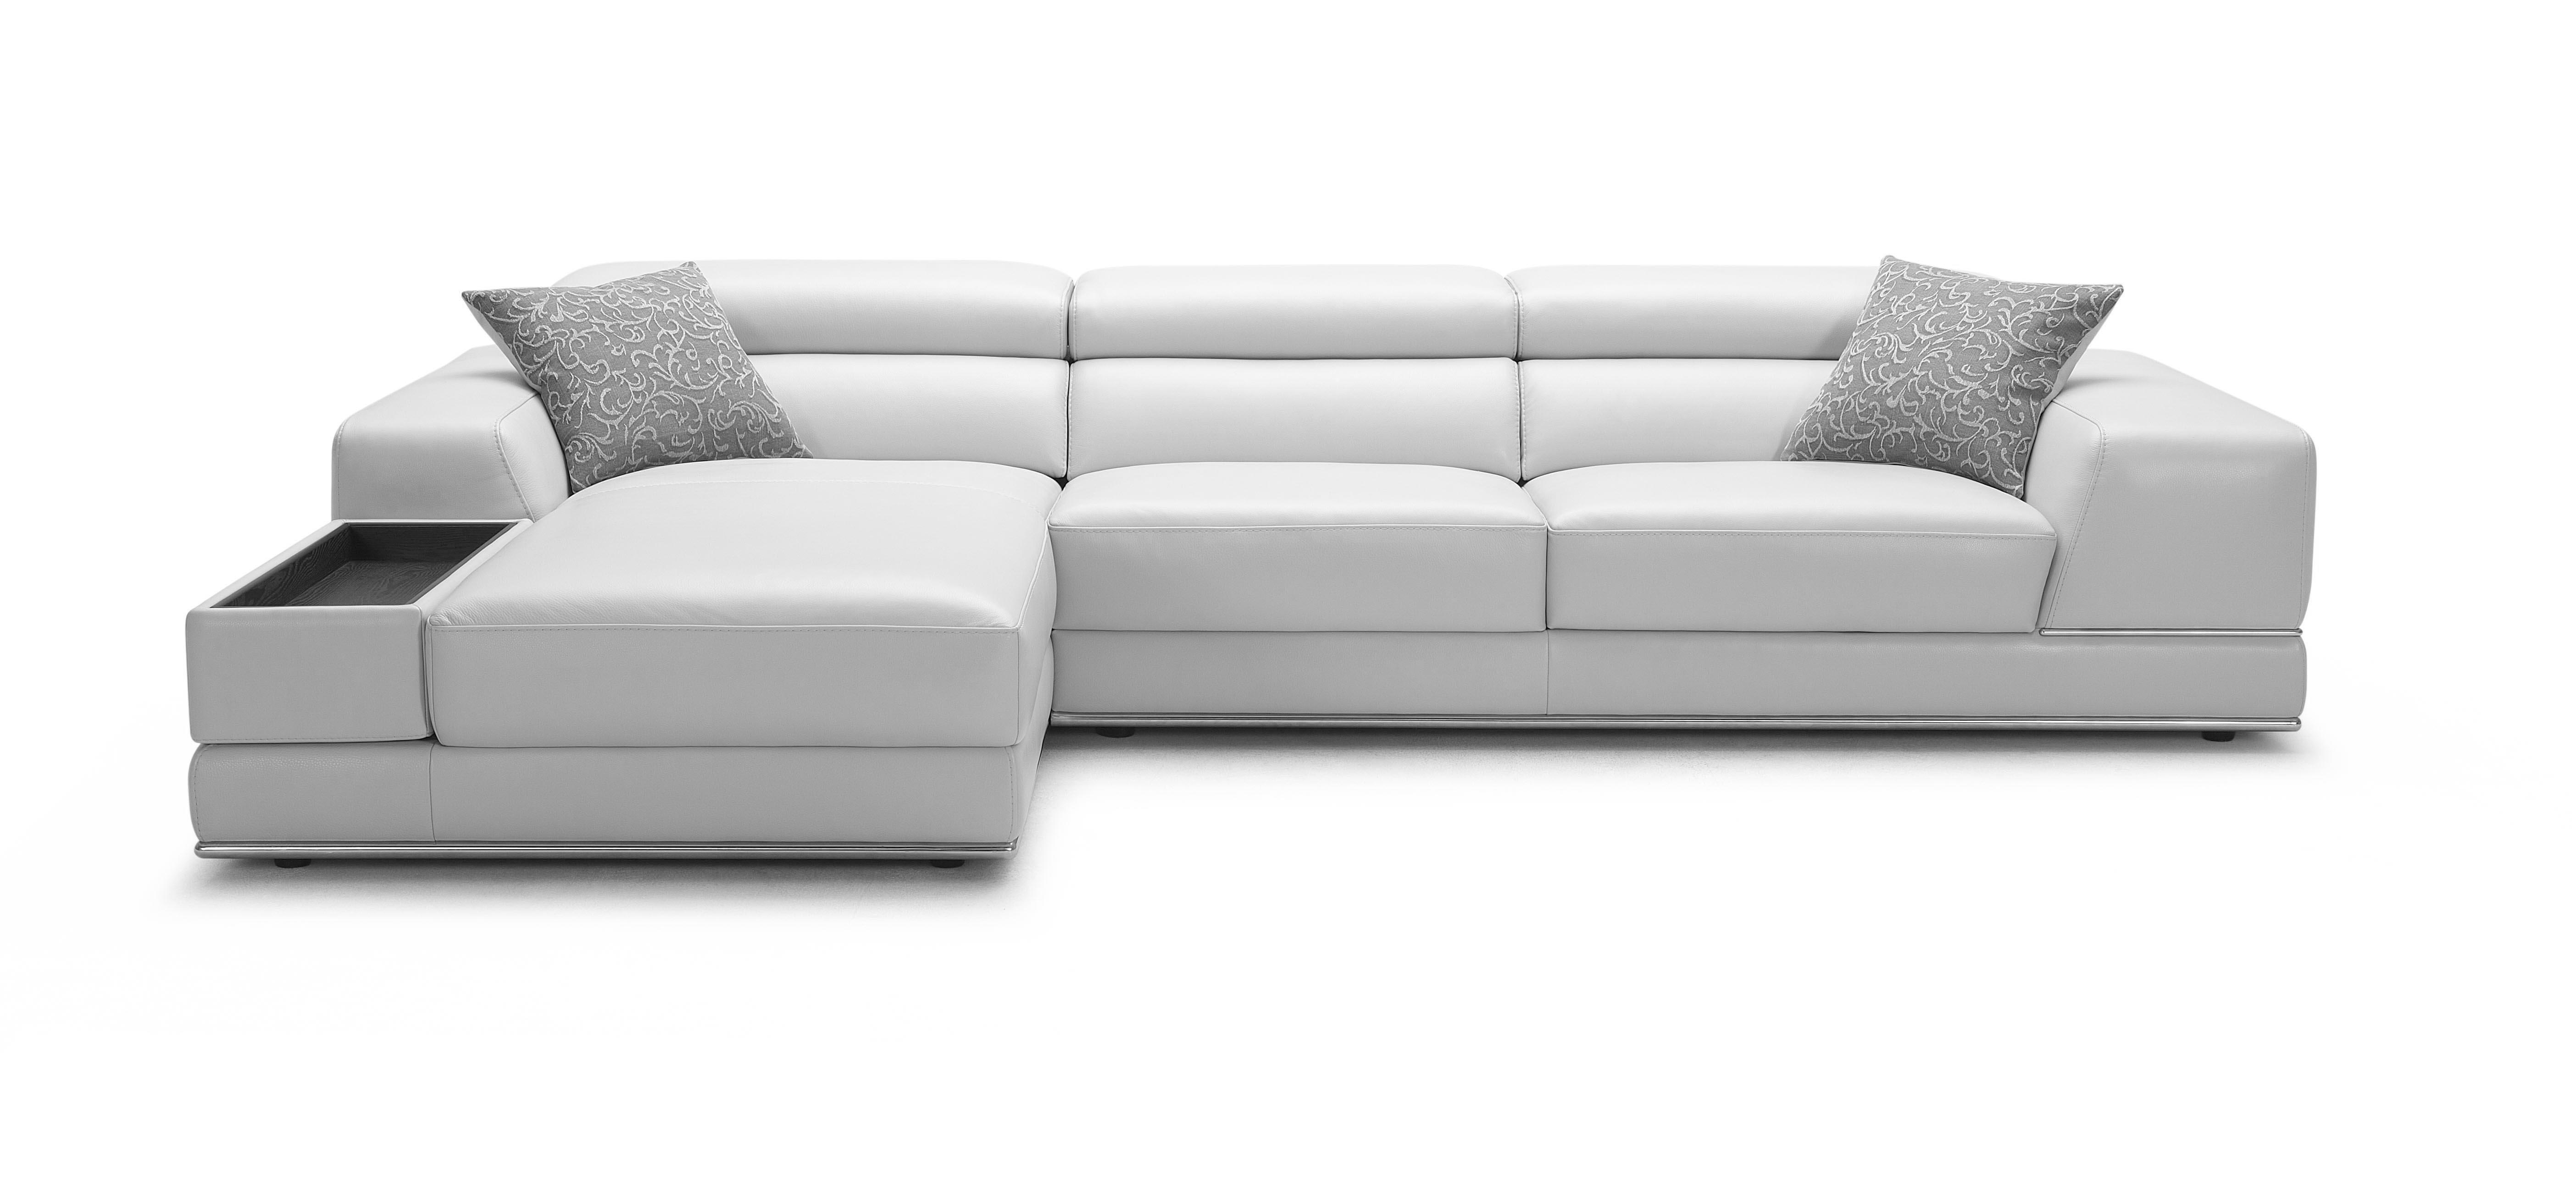 Furniture : Sectional Sofa Greensboro Nc Sectional Sofa Chaise Within Newest Sectional Sofas In Greensboro Nc (View 18 of 20)